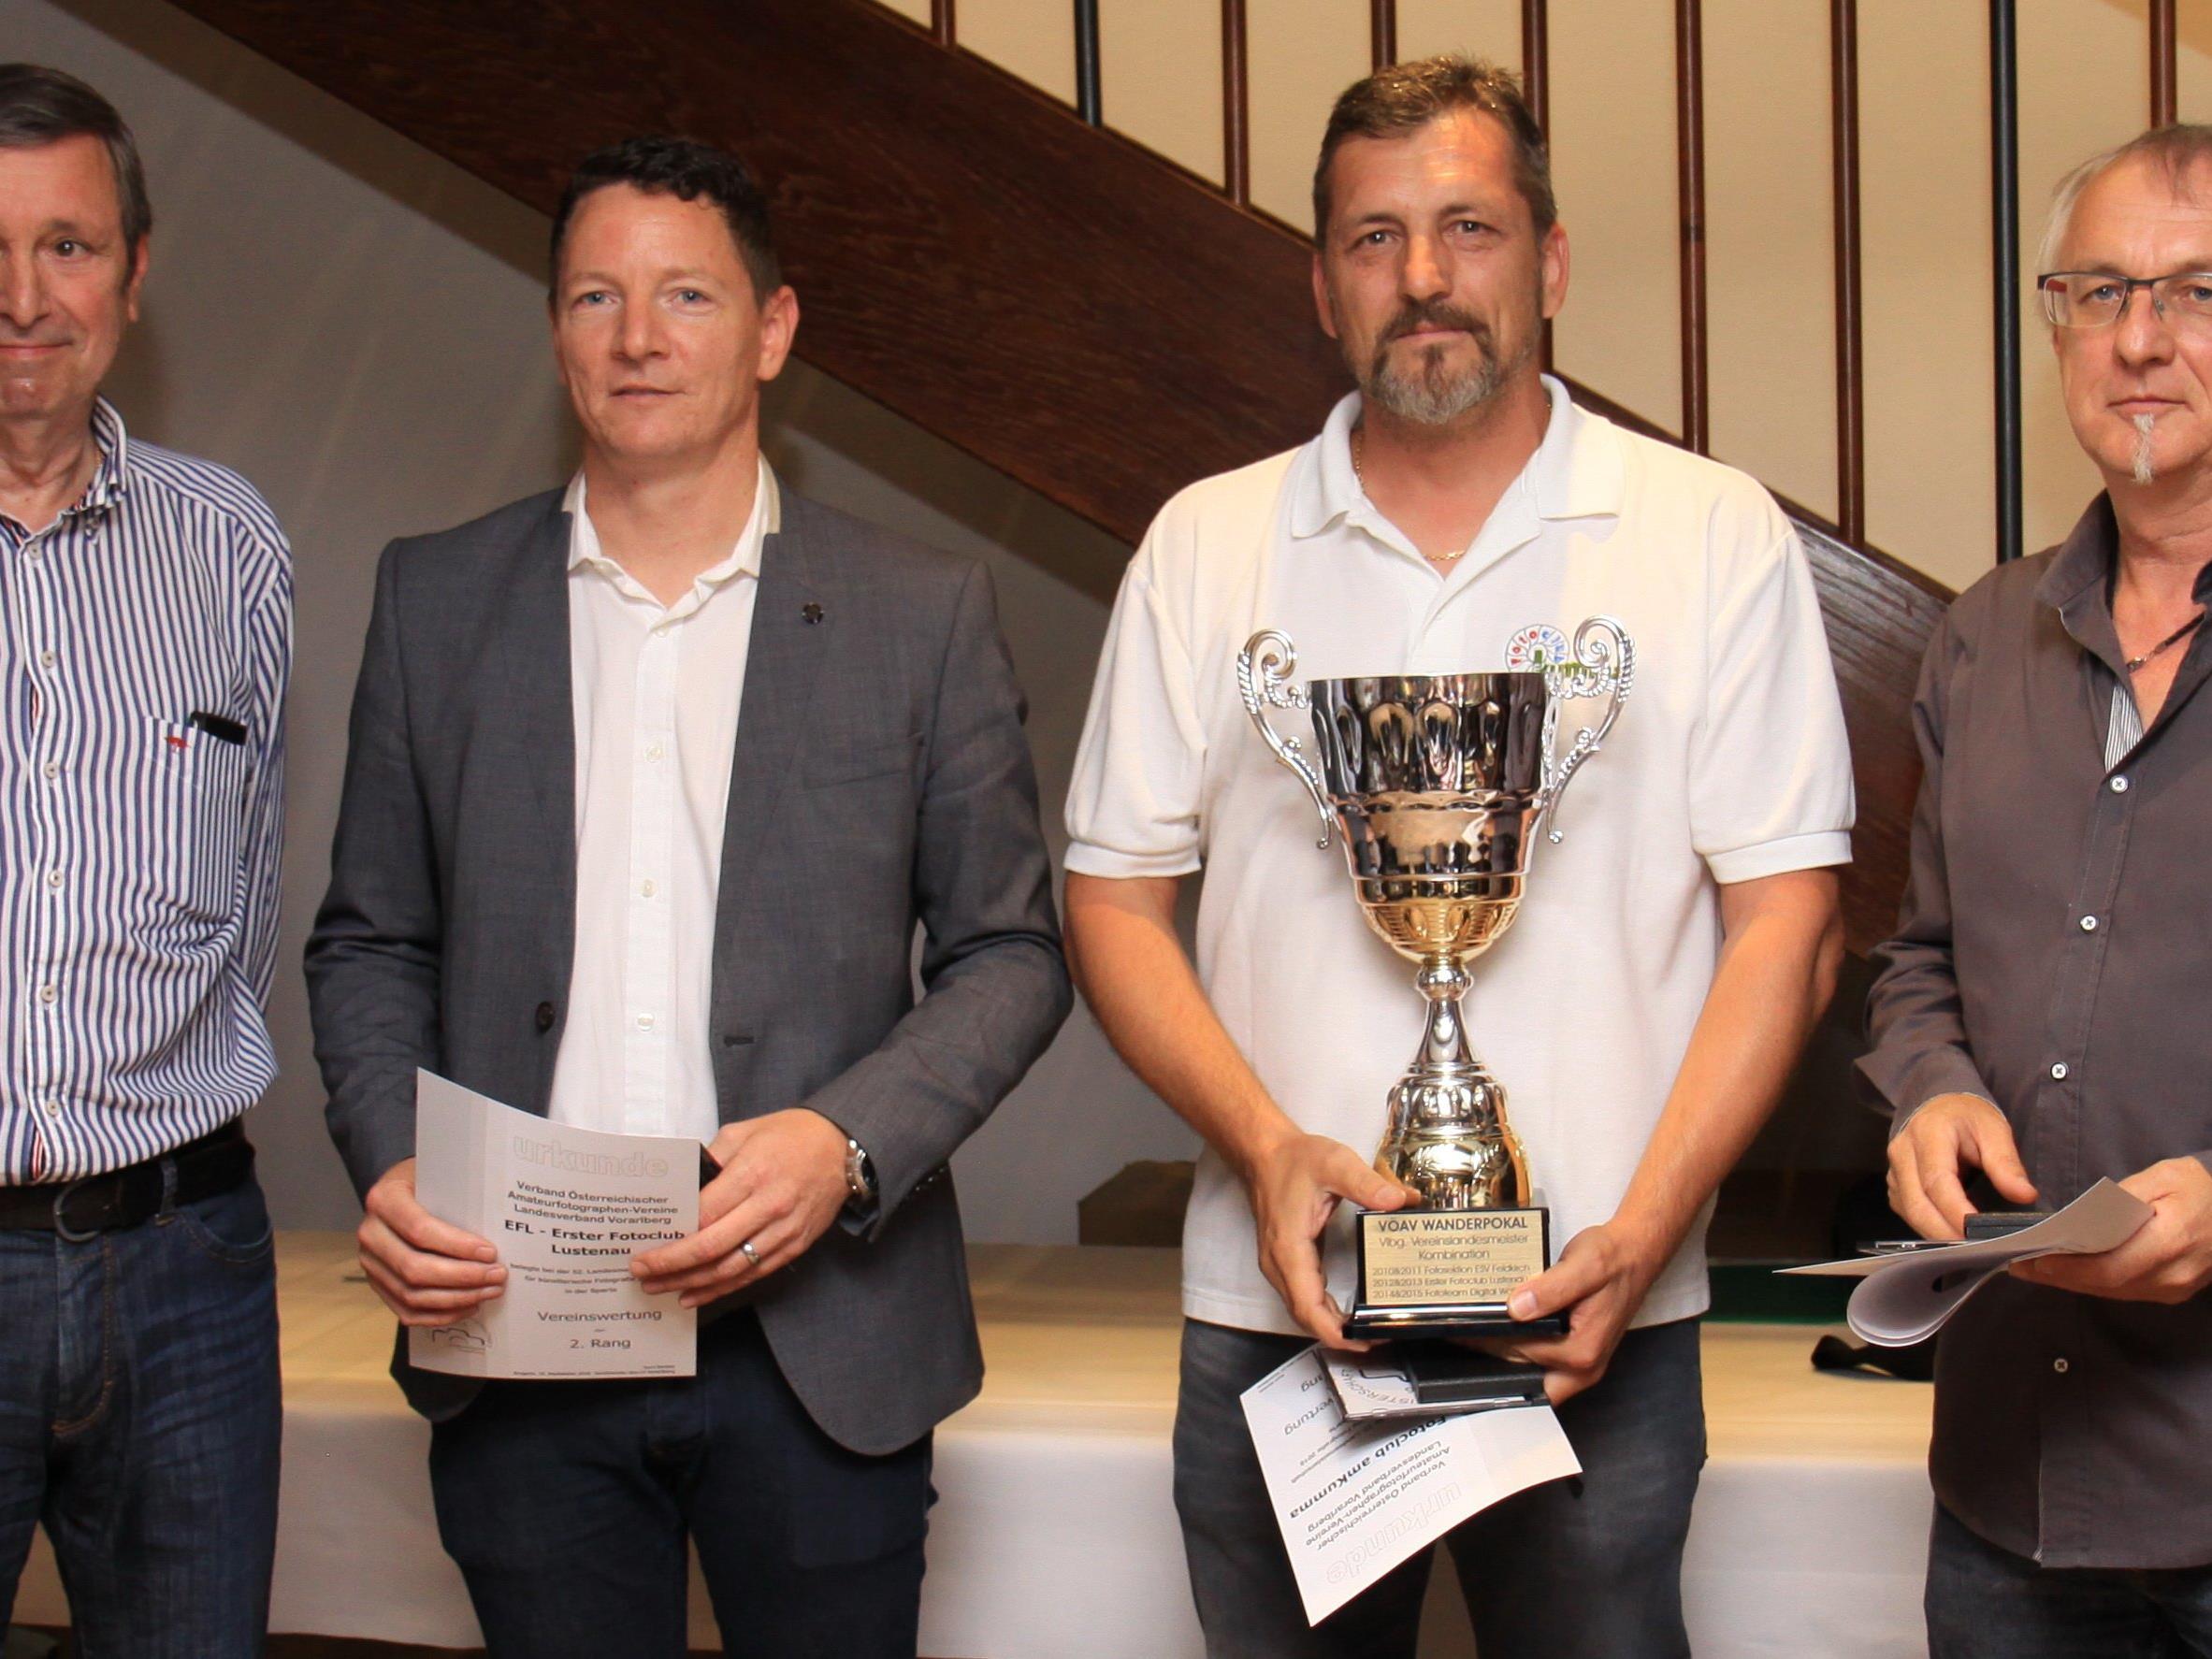 Fotclub am Kumma Obmann Jürgen Grasmuck (2.v.r.) übernahm voller STolz den Wanderpokal